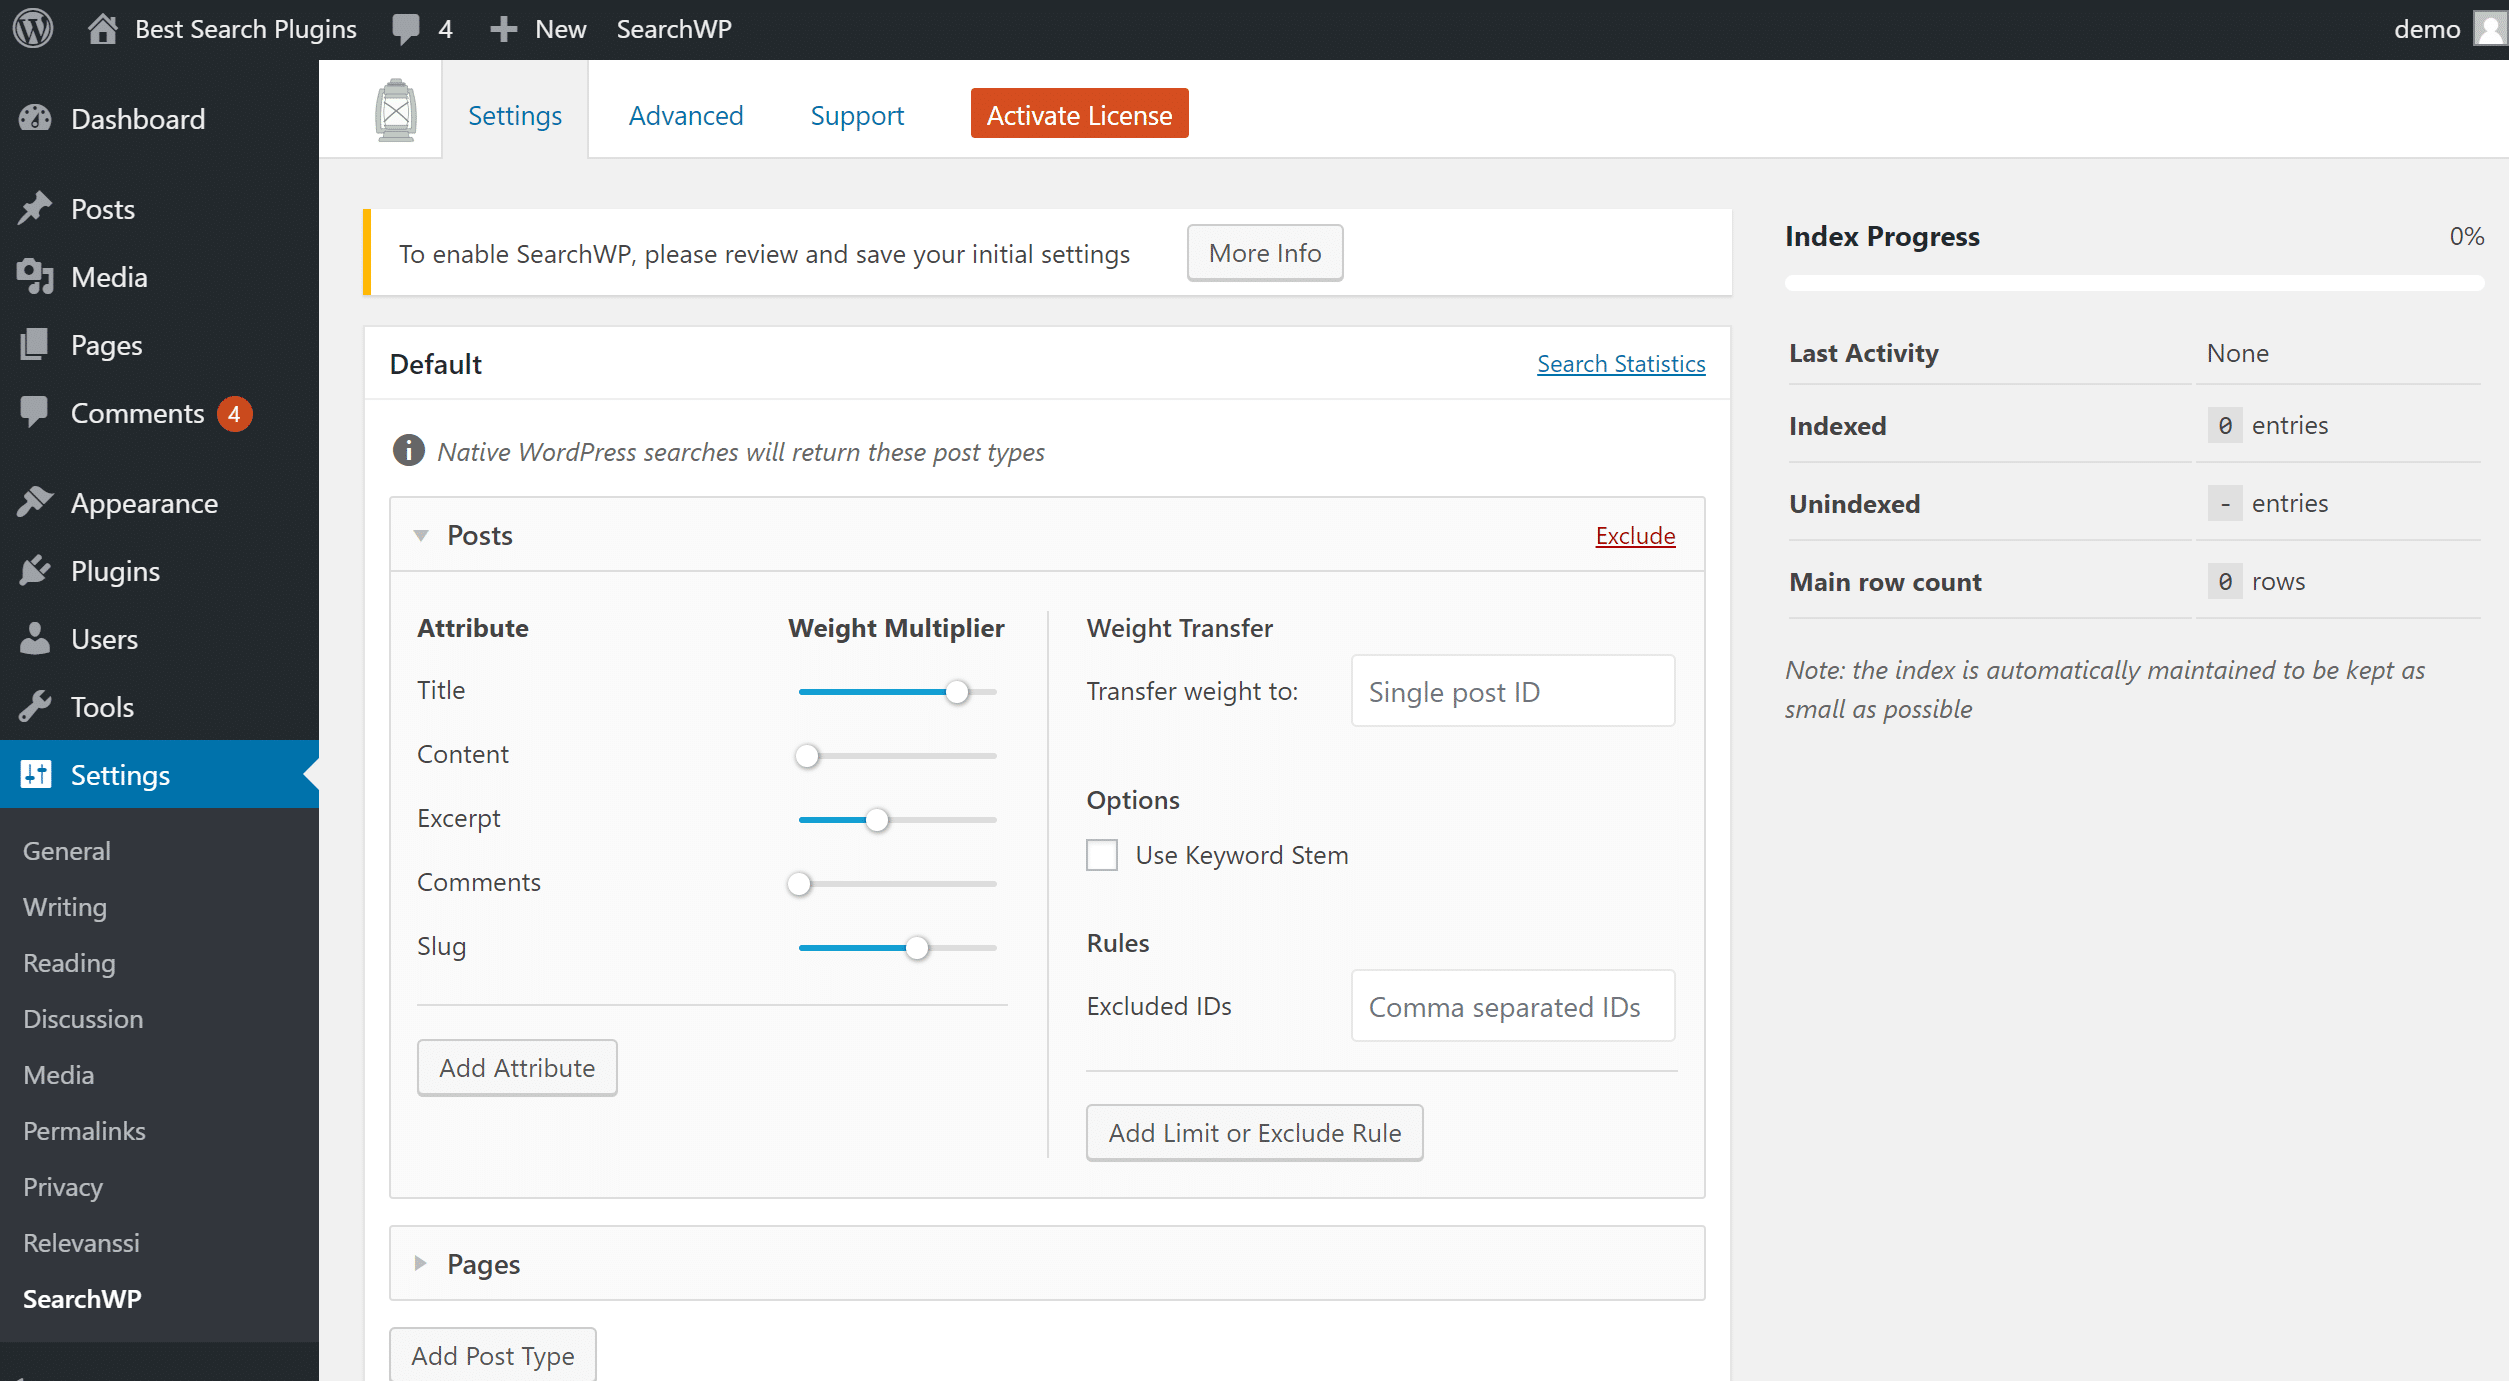 SearchWP settings